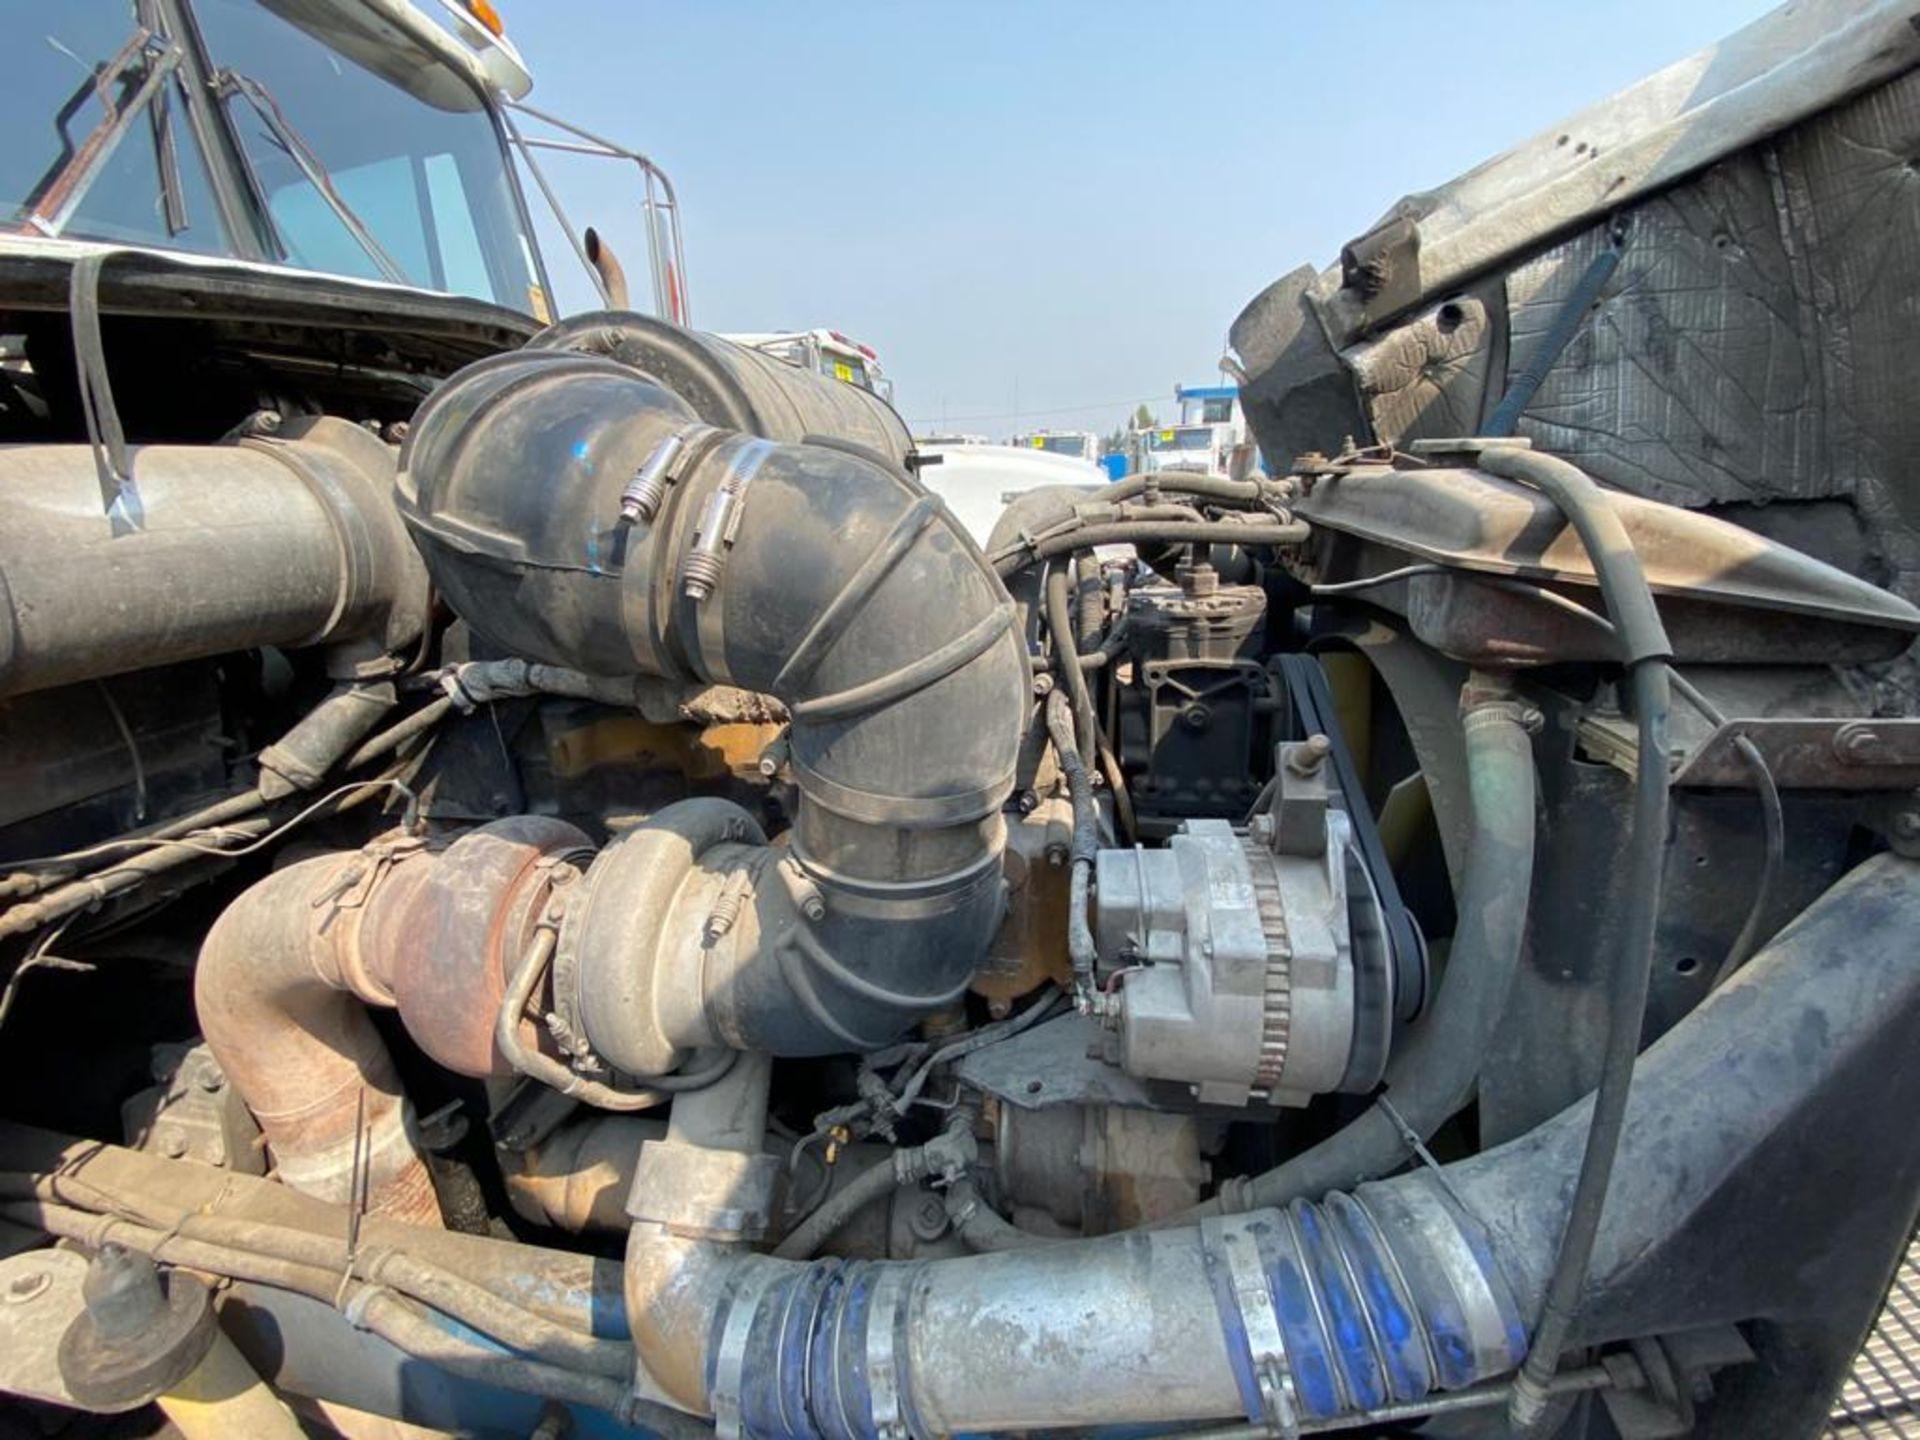 1999 Kenworth Sleeper truck tractor, standard transmission of 18 speeds - Image 65 of 72